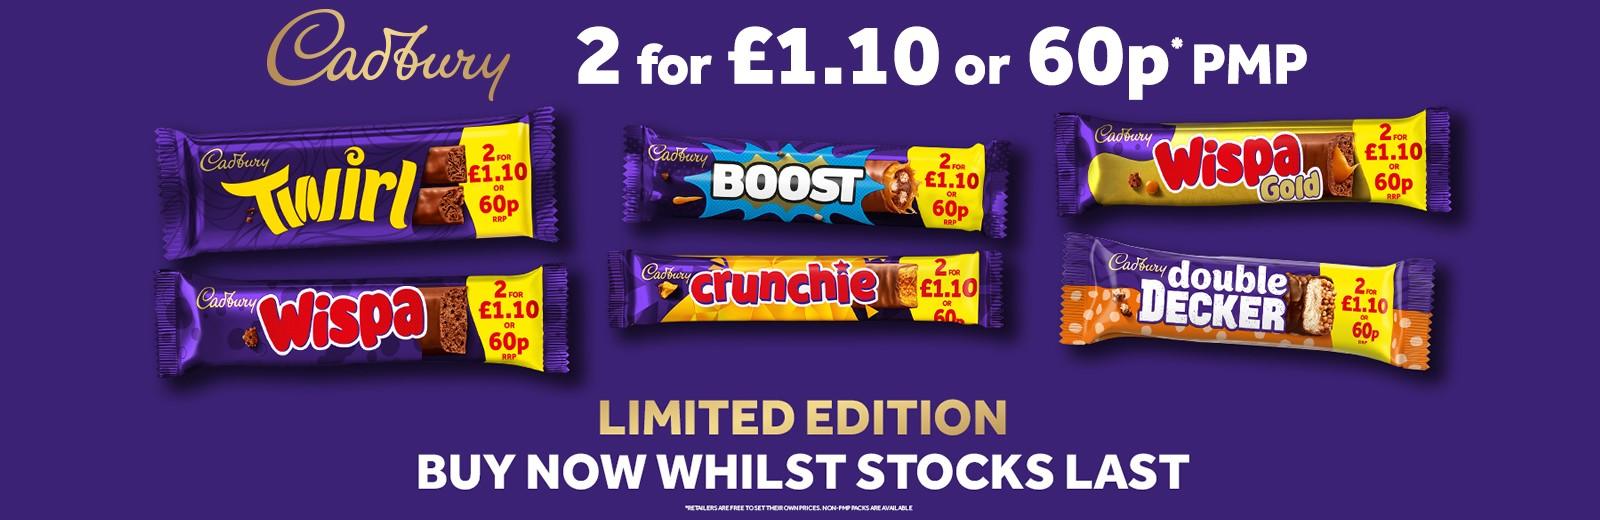 Cadbury 2 for 110 1600 x 520